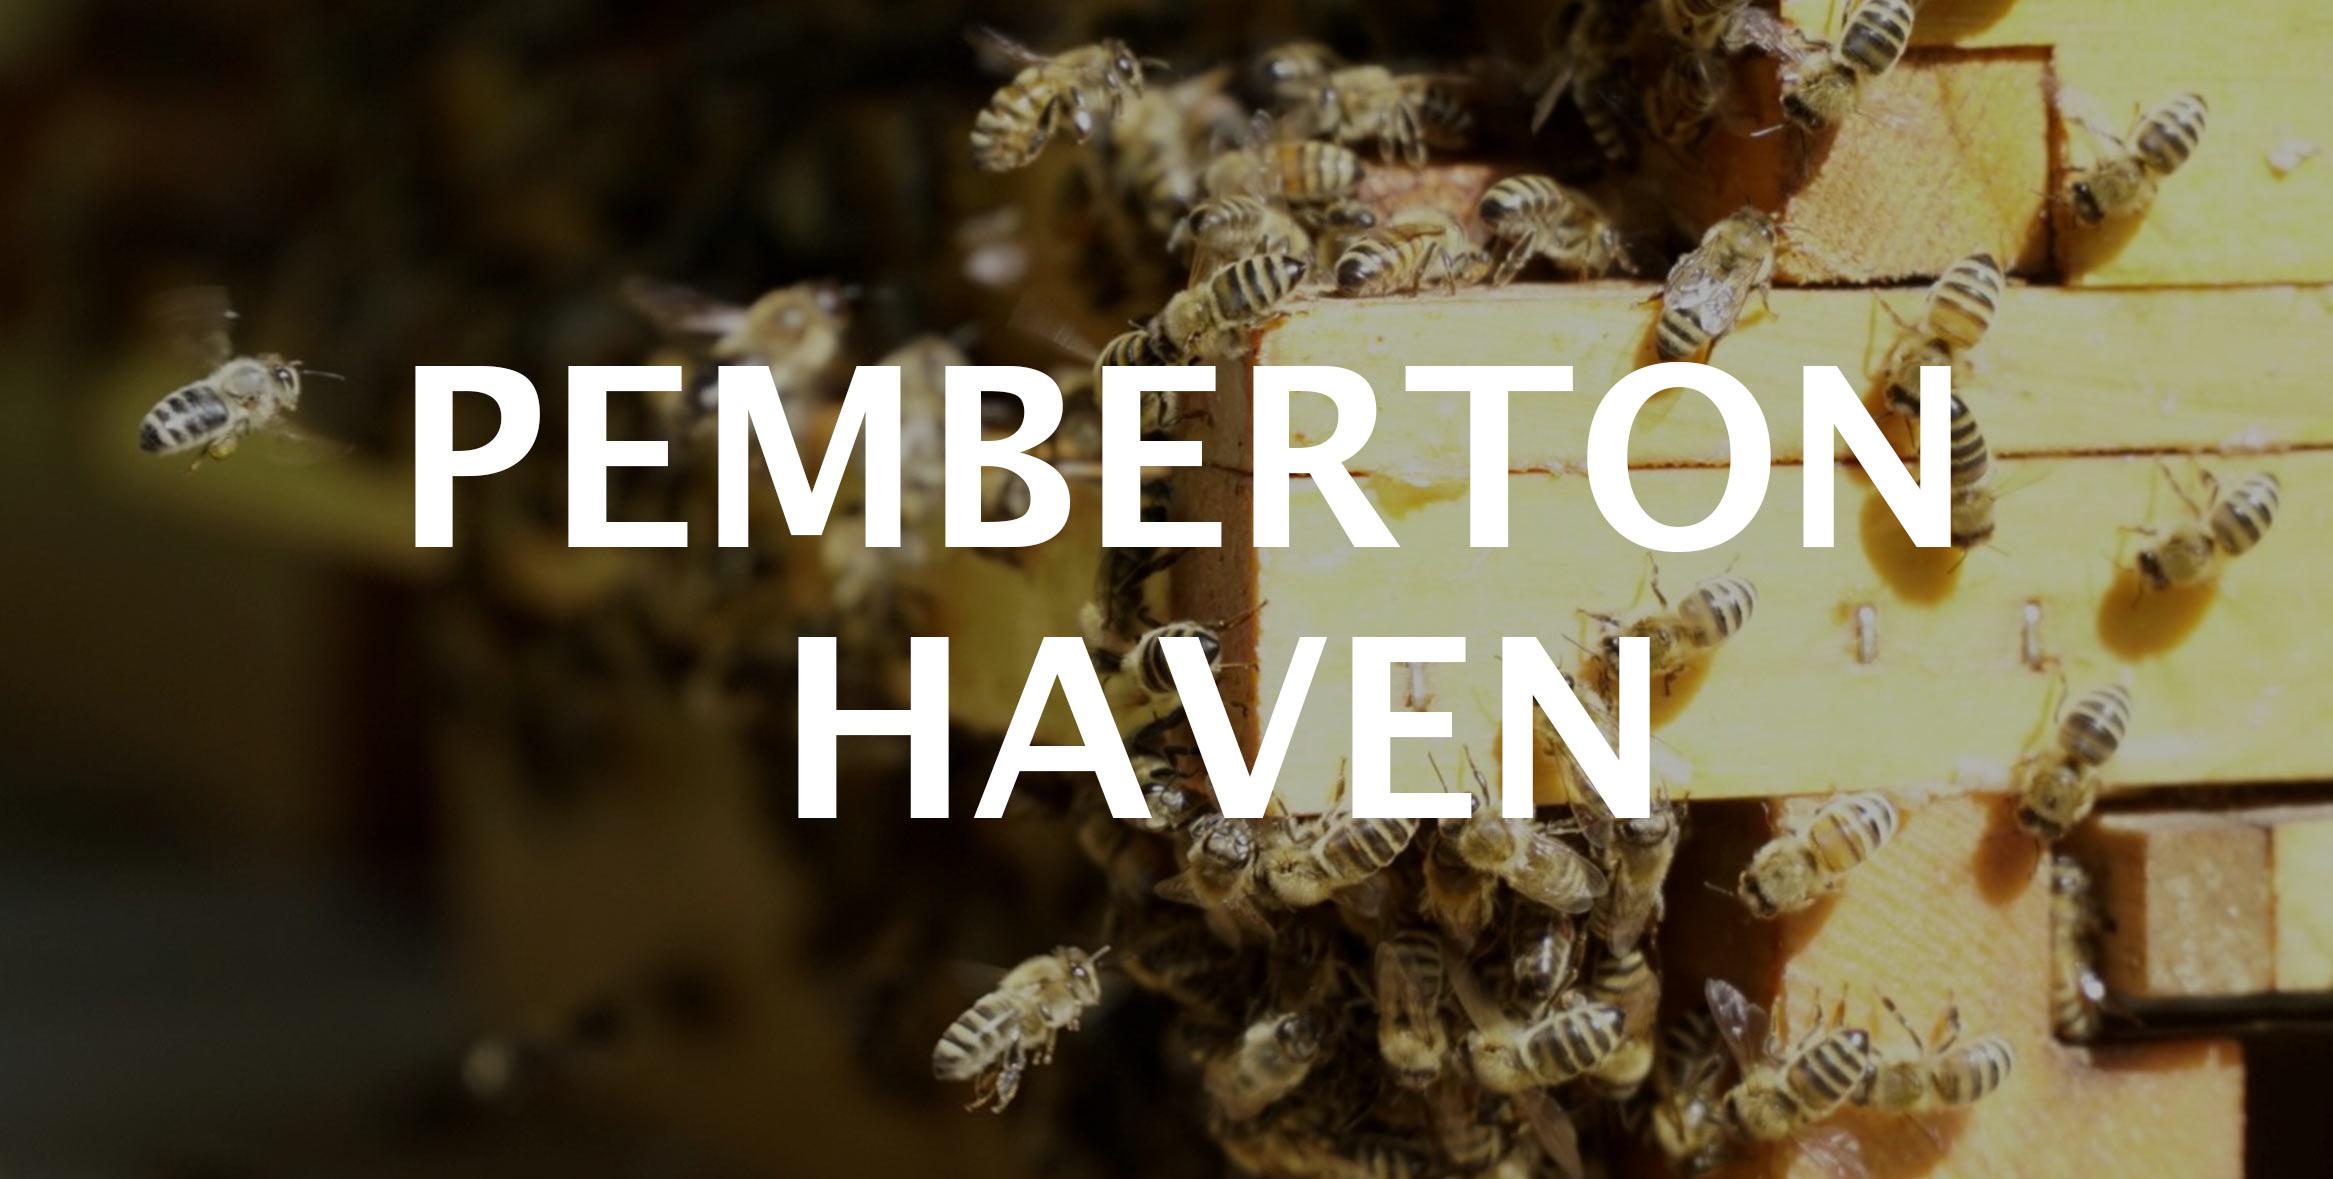 pemcap-haven-home-bees.jpg